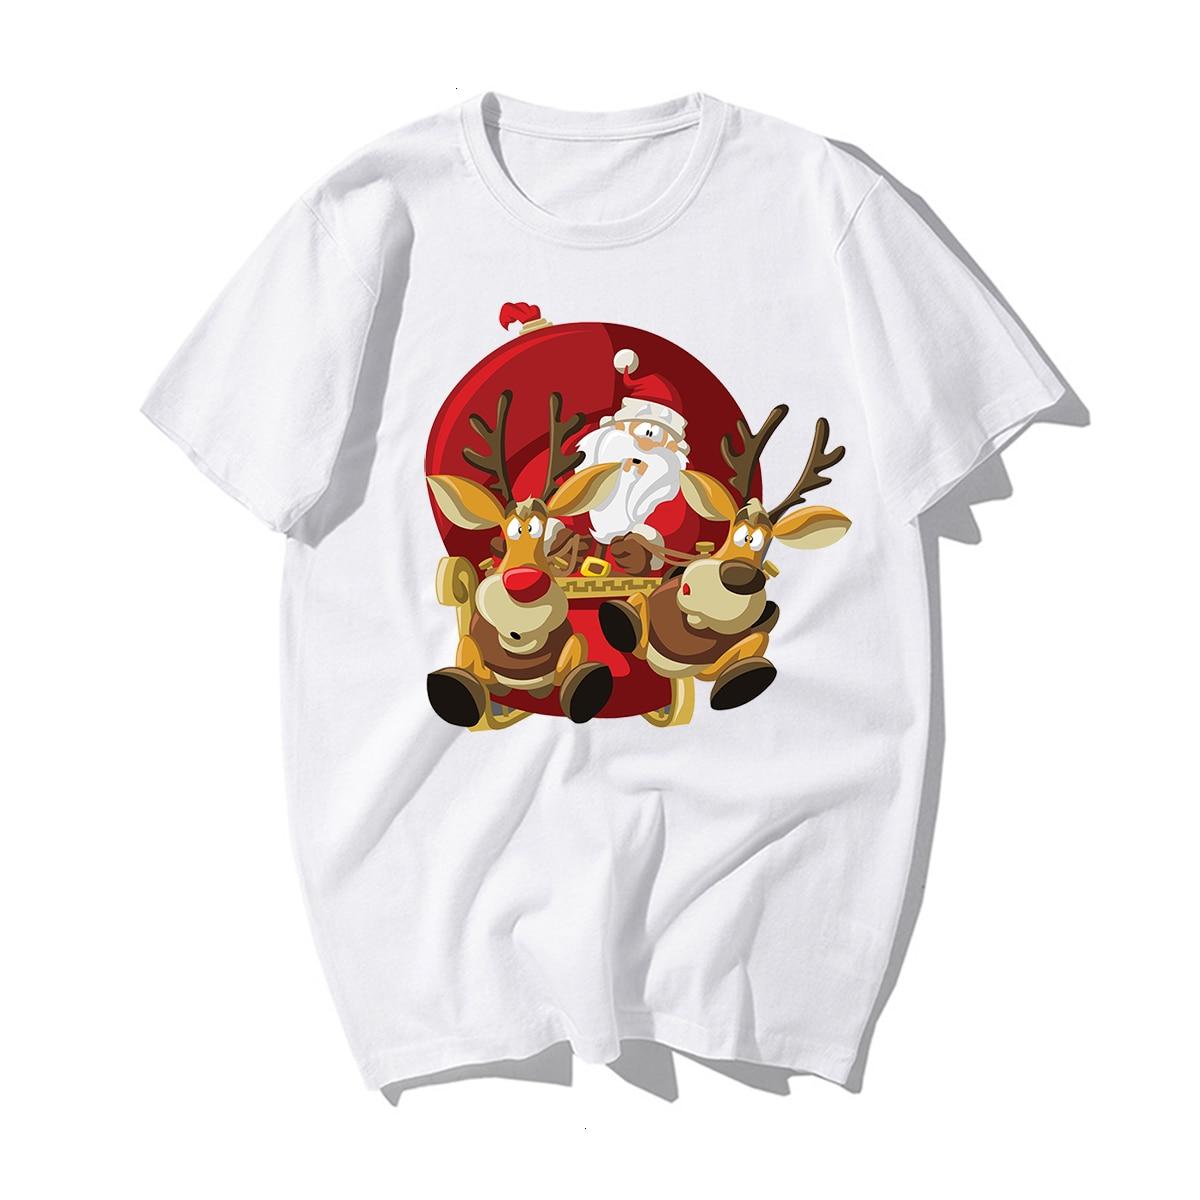 Funny Santa Claus Reindeer Lover CHRISTMAS GIFT T-SHIRT Happy New Year T Shirt Man Tshirt Merry CHRISTMAS Casual Cotton Kawaii 7